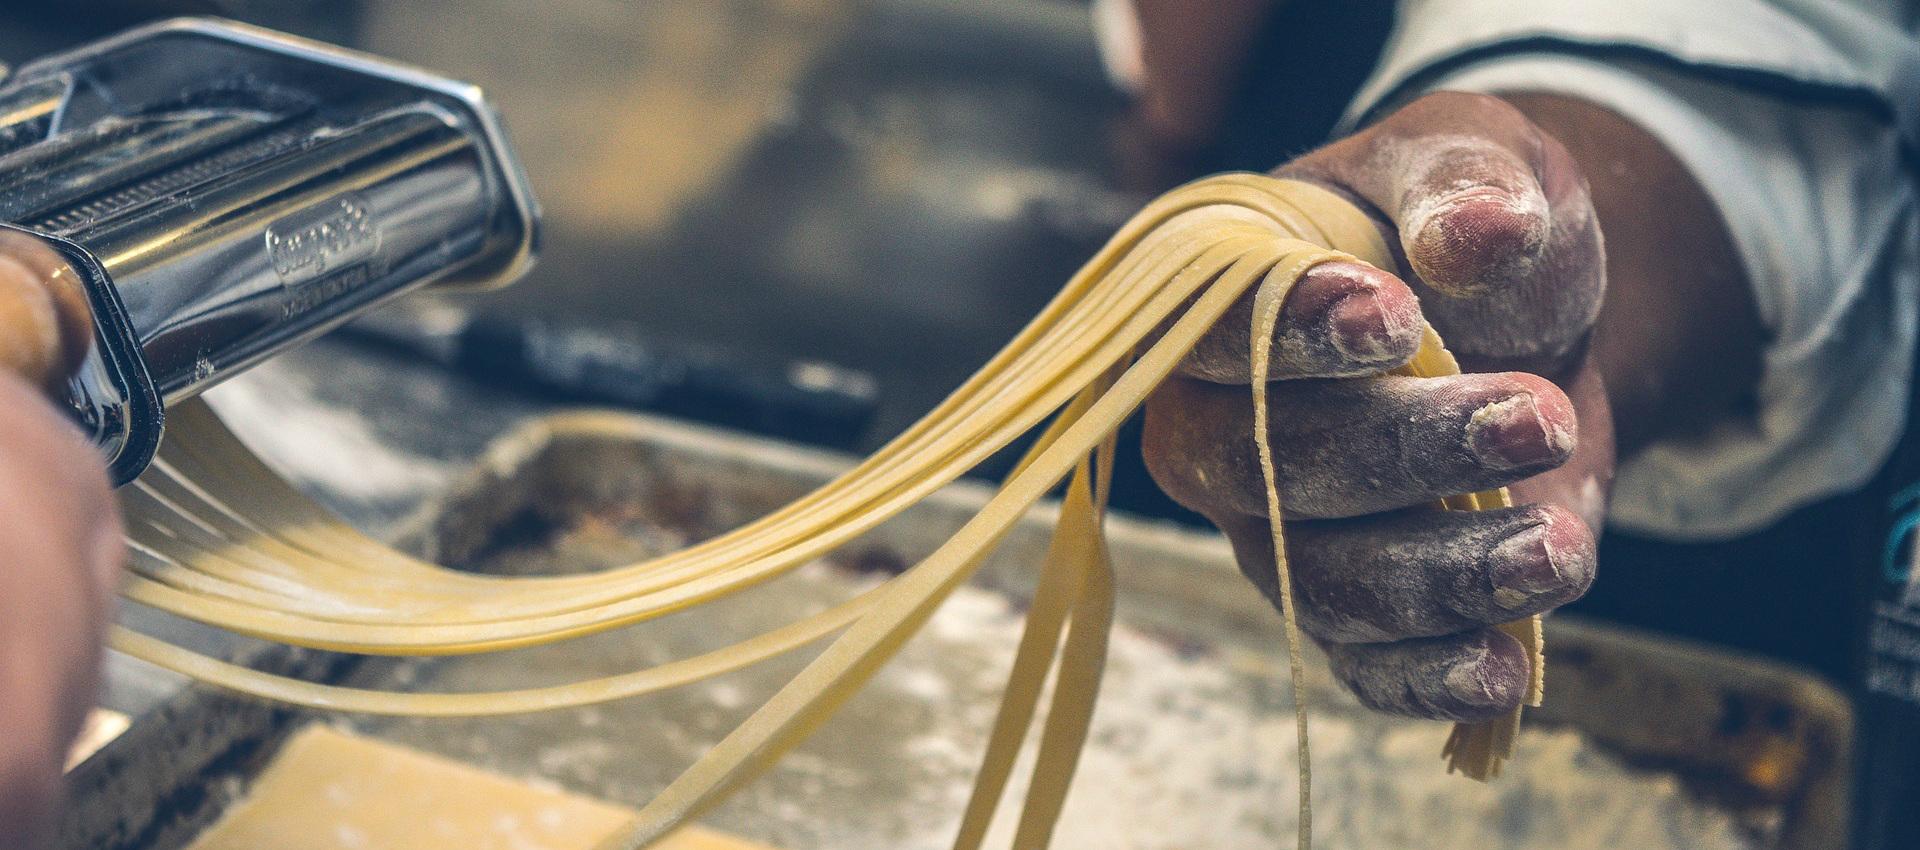 Handmade Pasta by Delizia